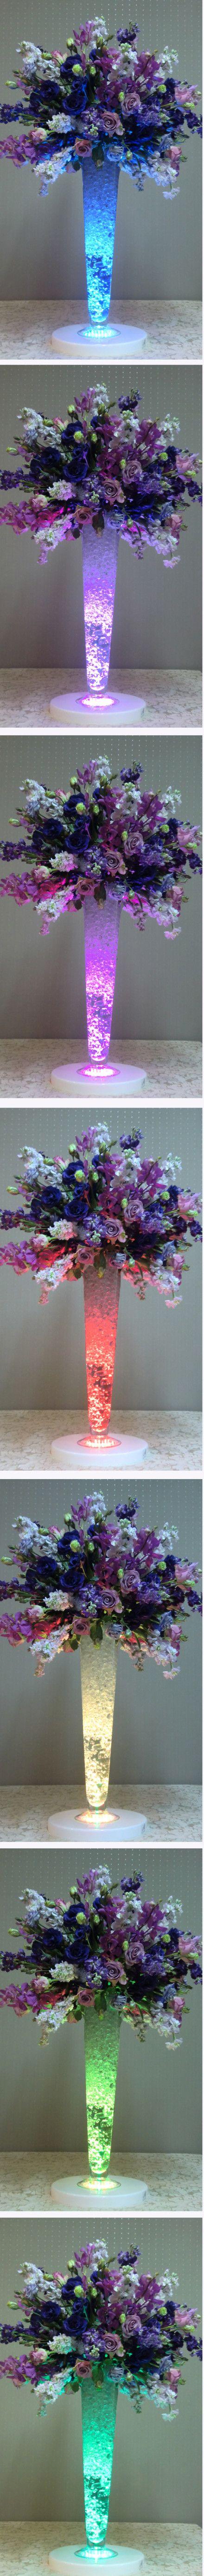 best wedding gifts images on pinterest wedding ideas weddings